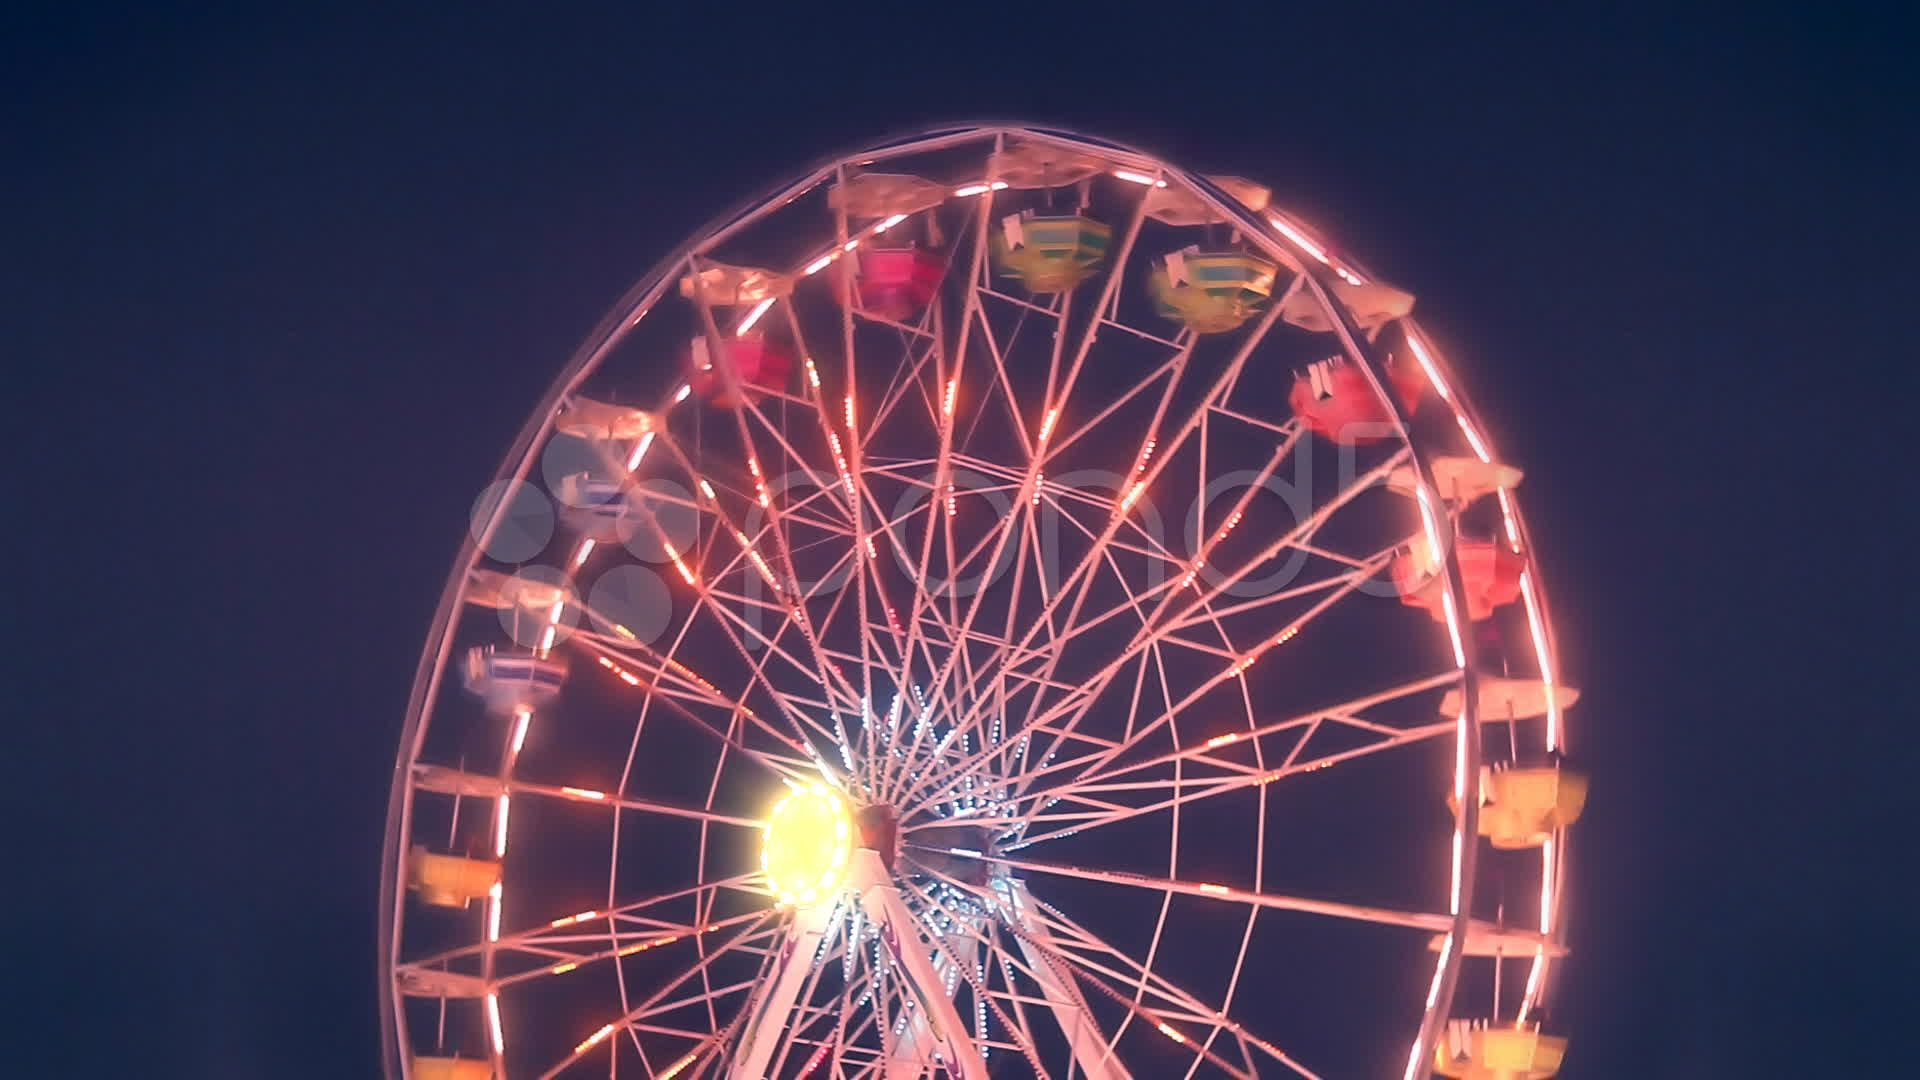 Ferris Wheel Carnival Ride At Night Stock Video 9916031